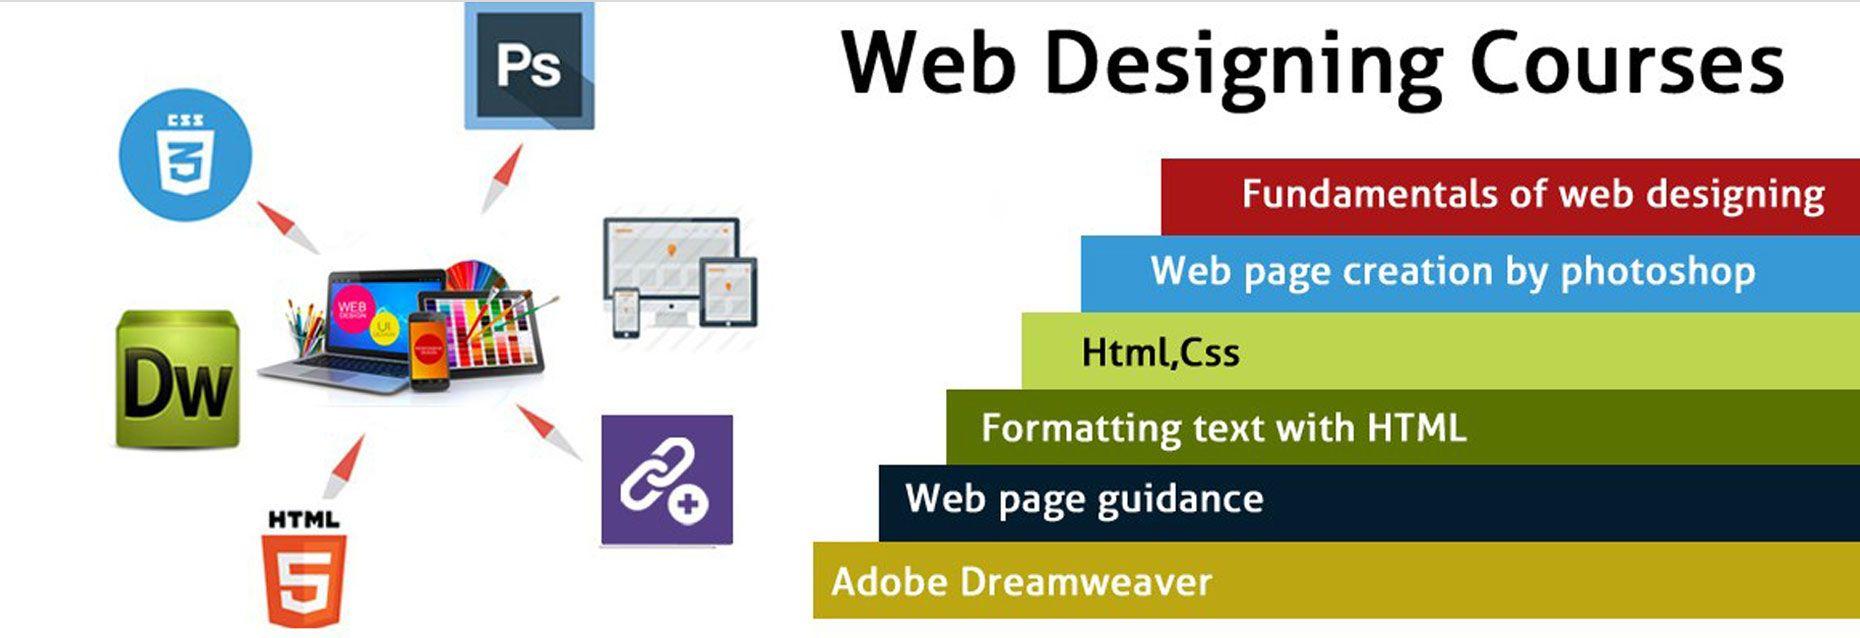 Web Design Courses Web Designing Training In Chandigarh Offer By Imesh Lab Best Web Designin Web Design Training Web Design Course Web Development Training